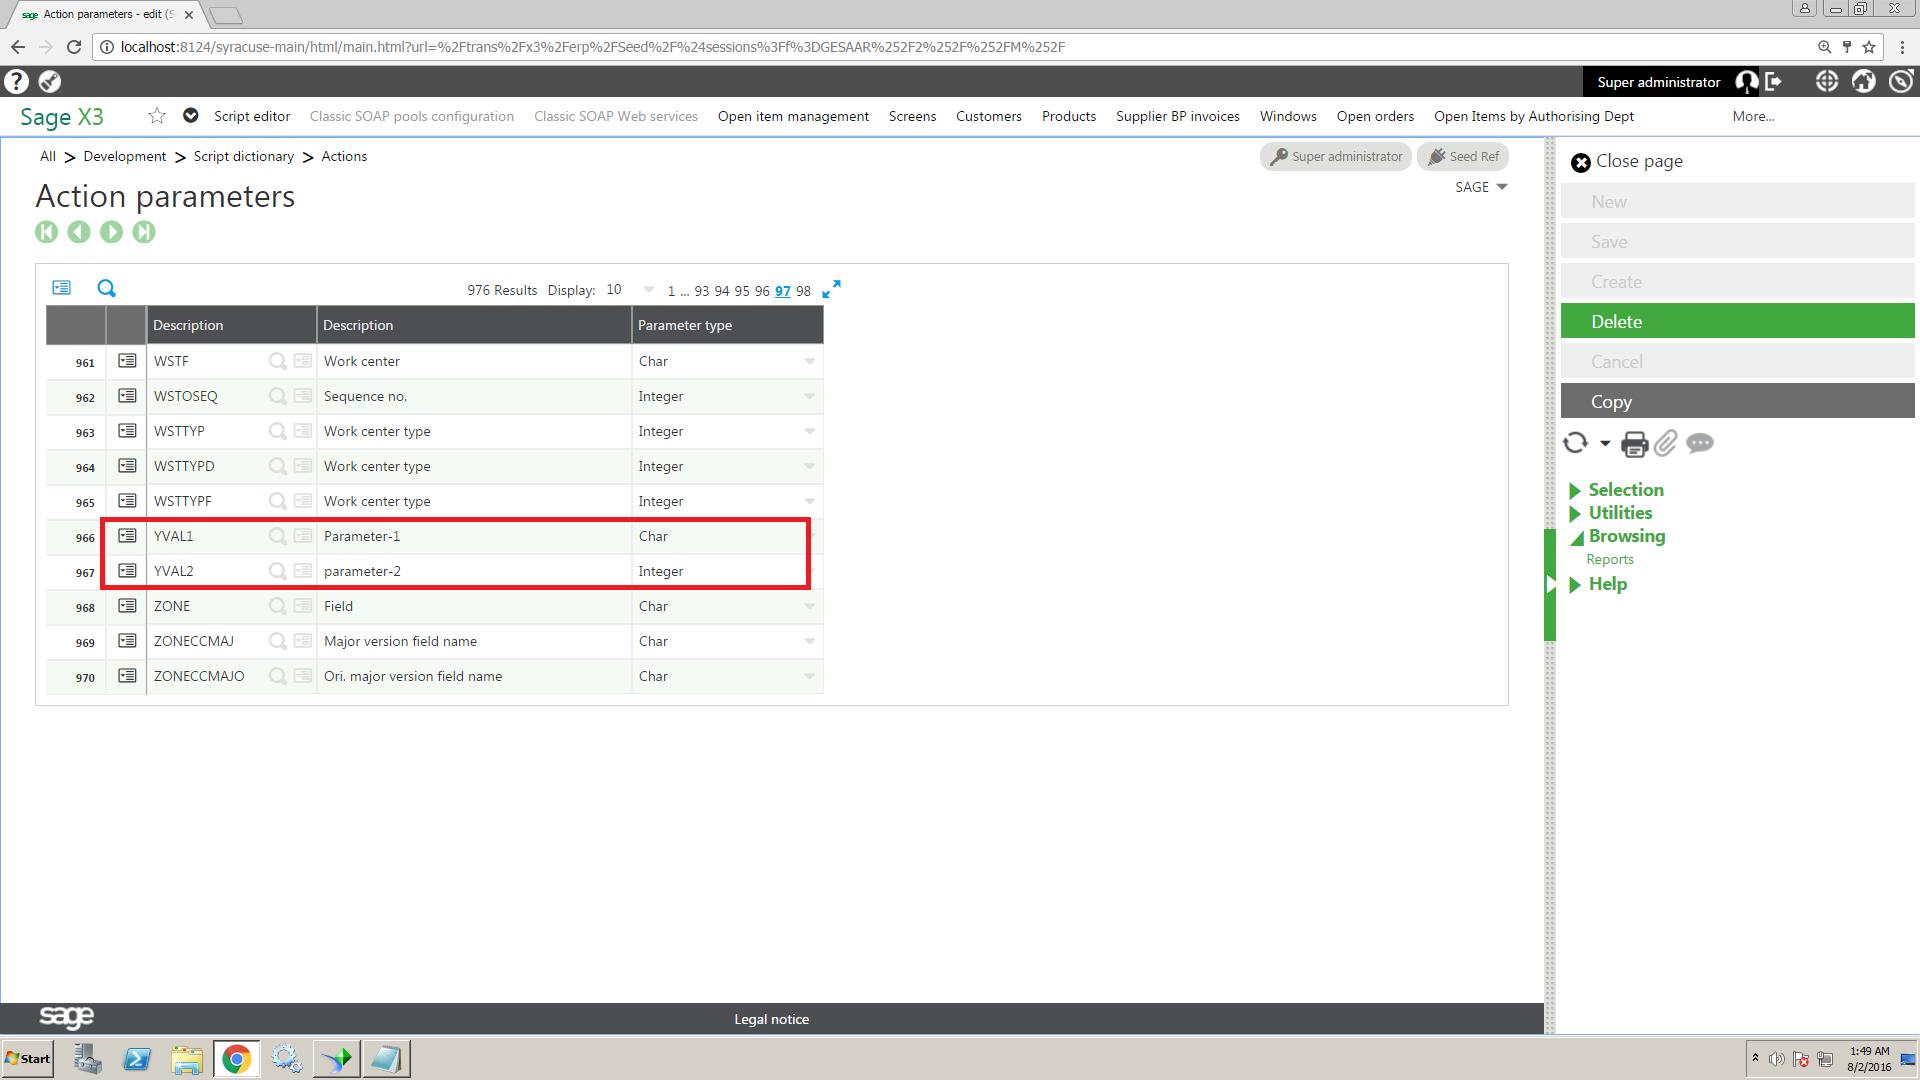 C:\Users\Administrator\Desktop\graphical requestor\param-1.3.png